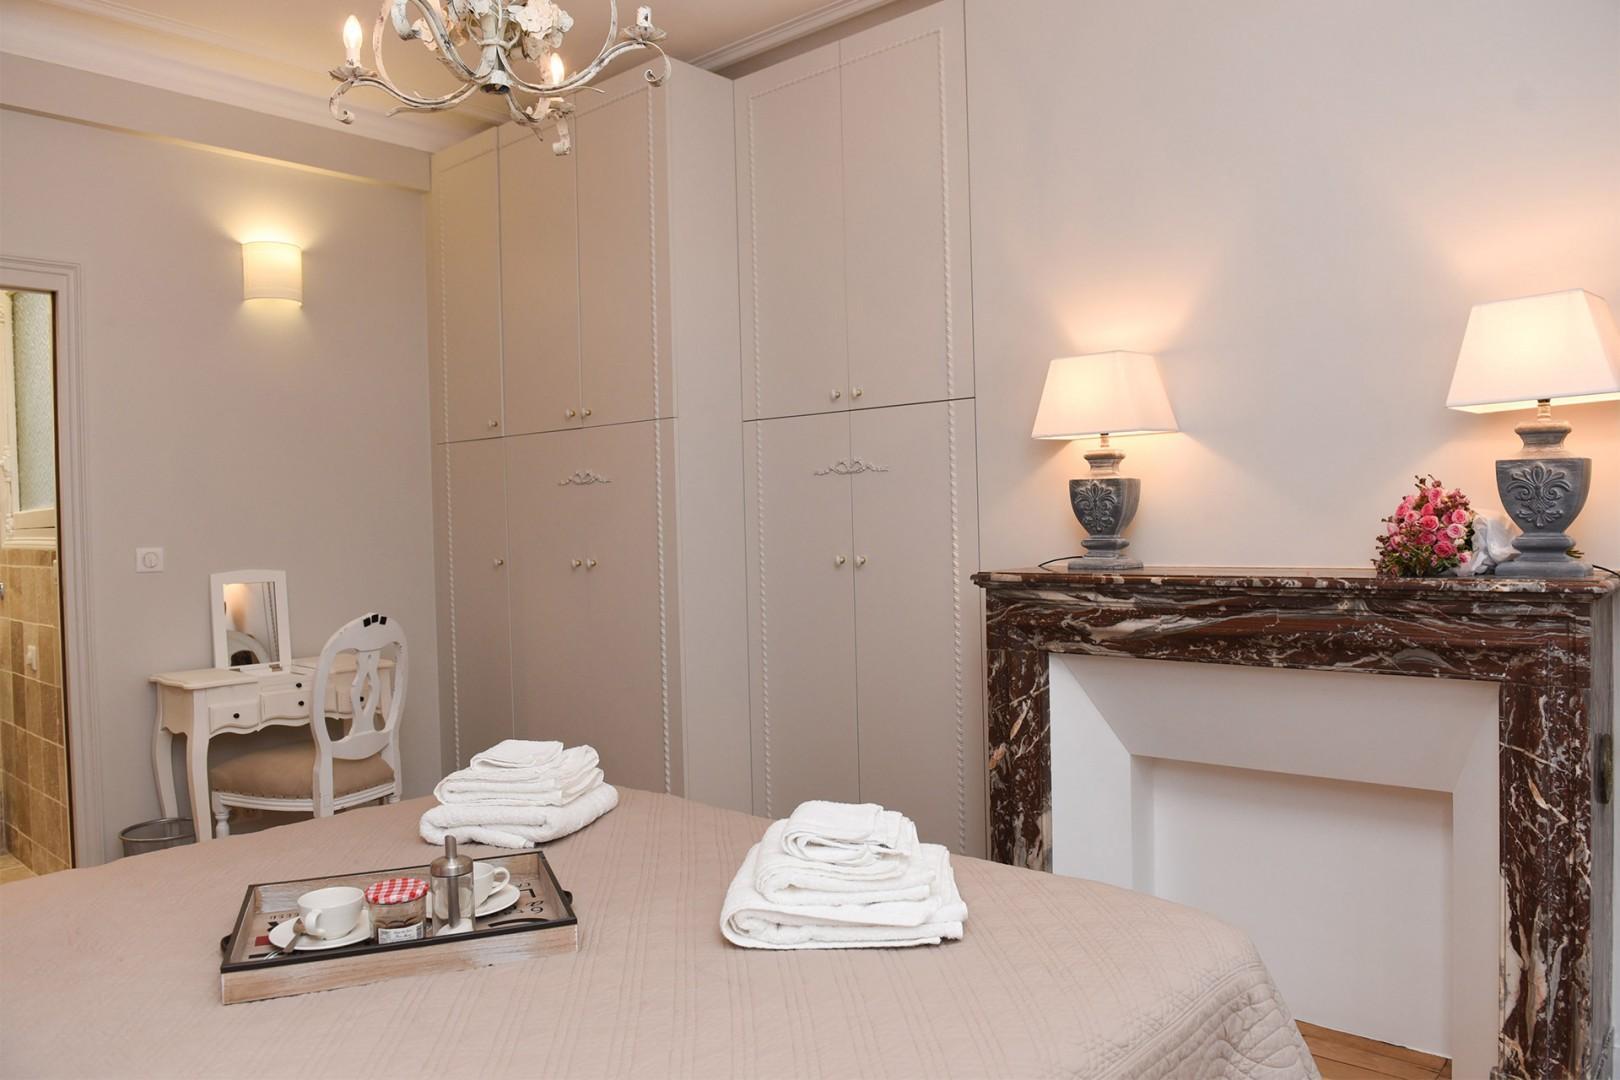 There is an en suite bathroom and plenty of built in storage in bedroom 1.